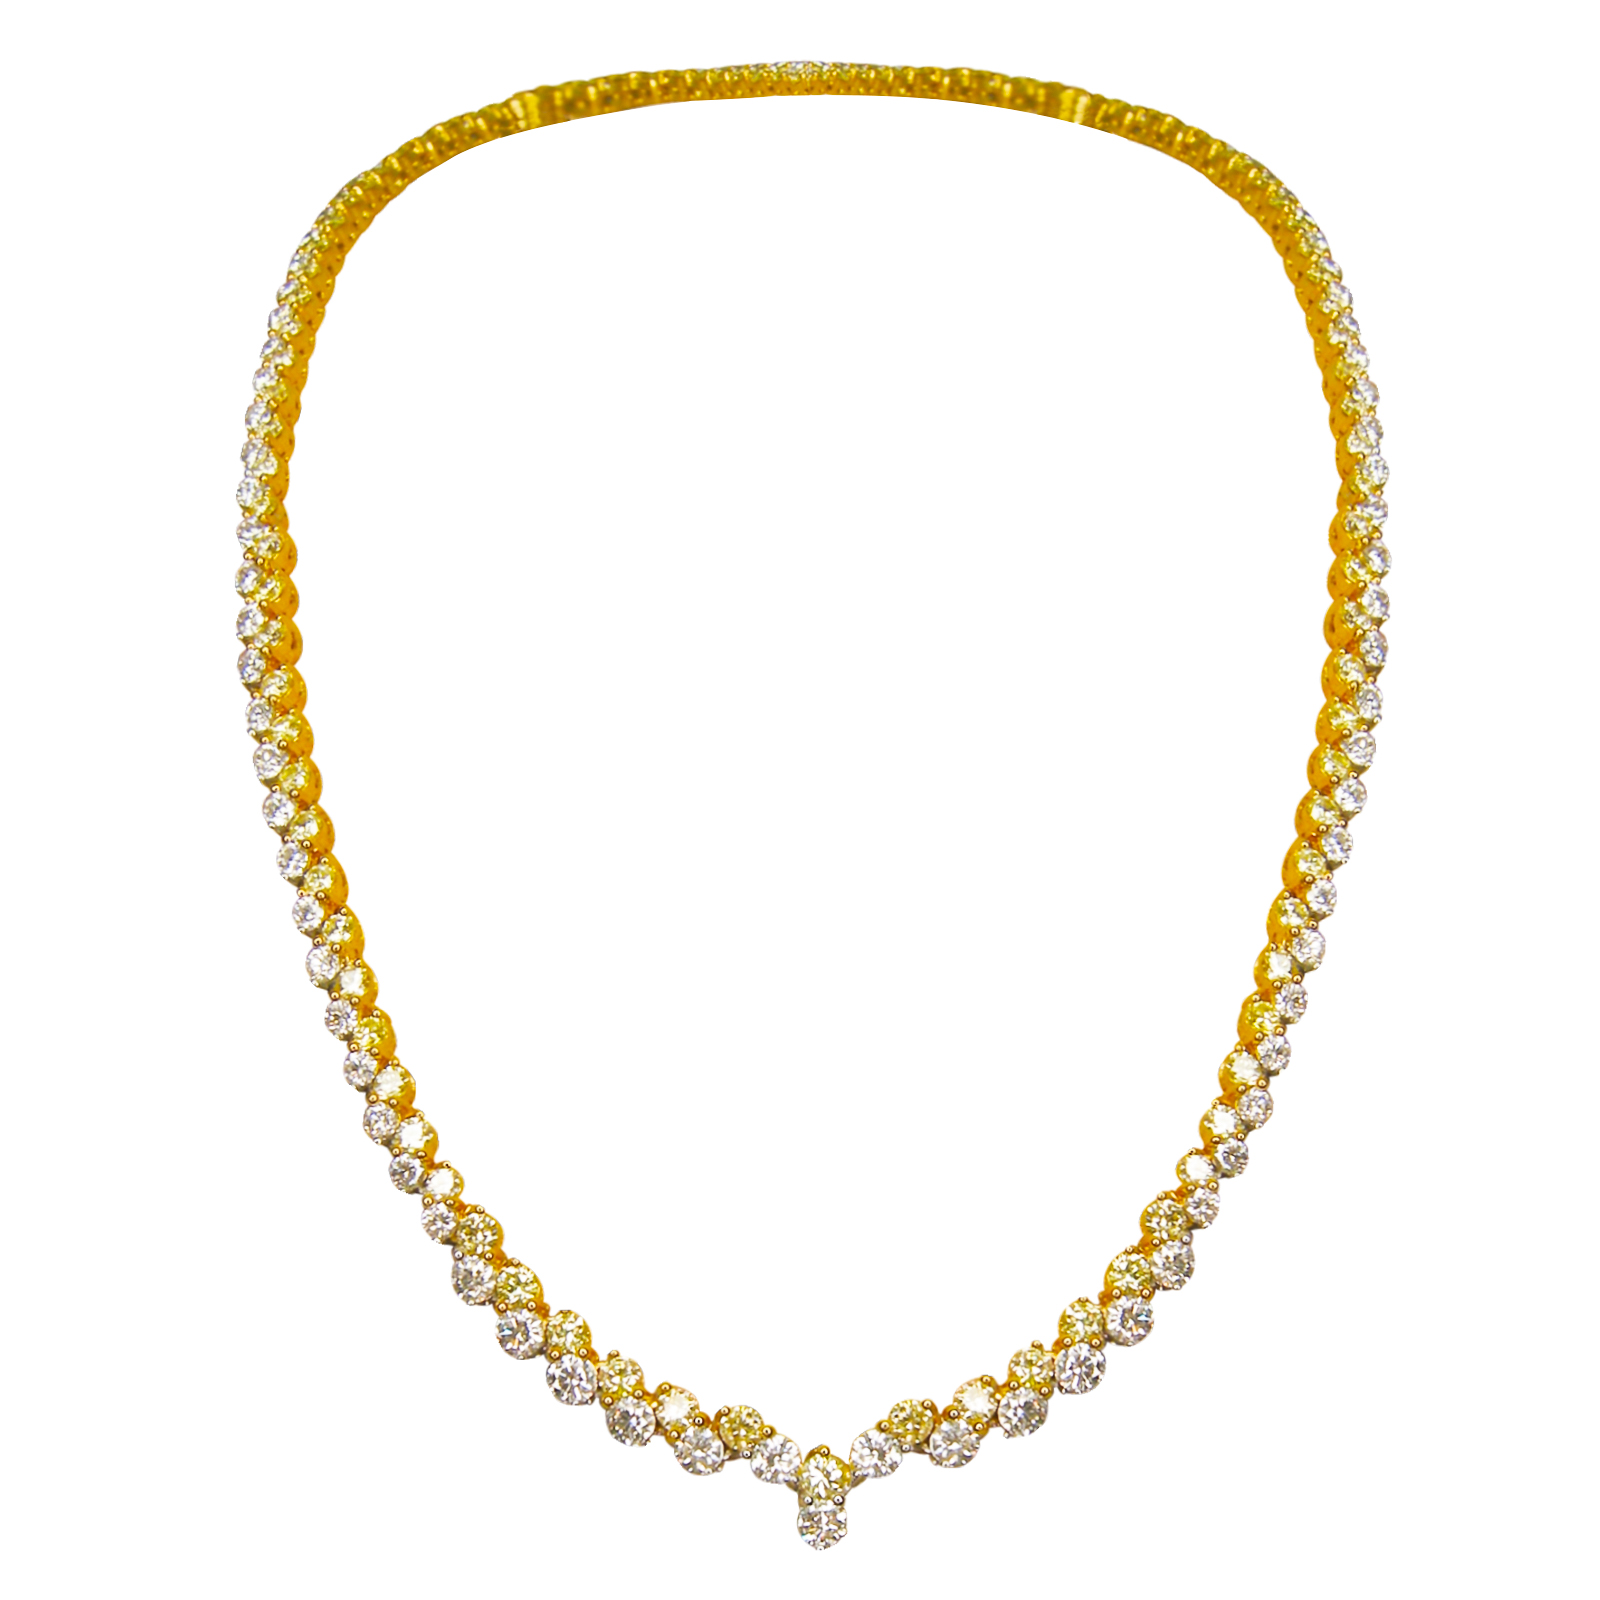 CANARY DIAMOND TENNIS NECKLACE